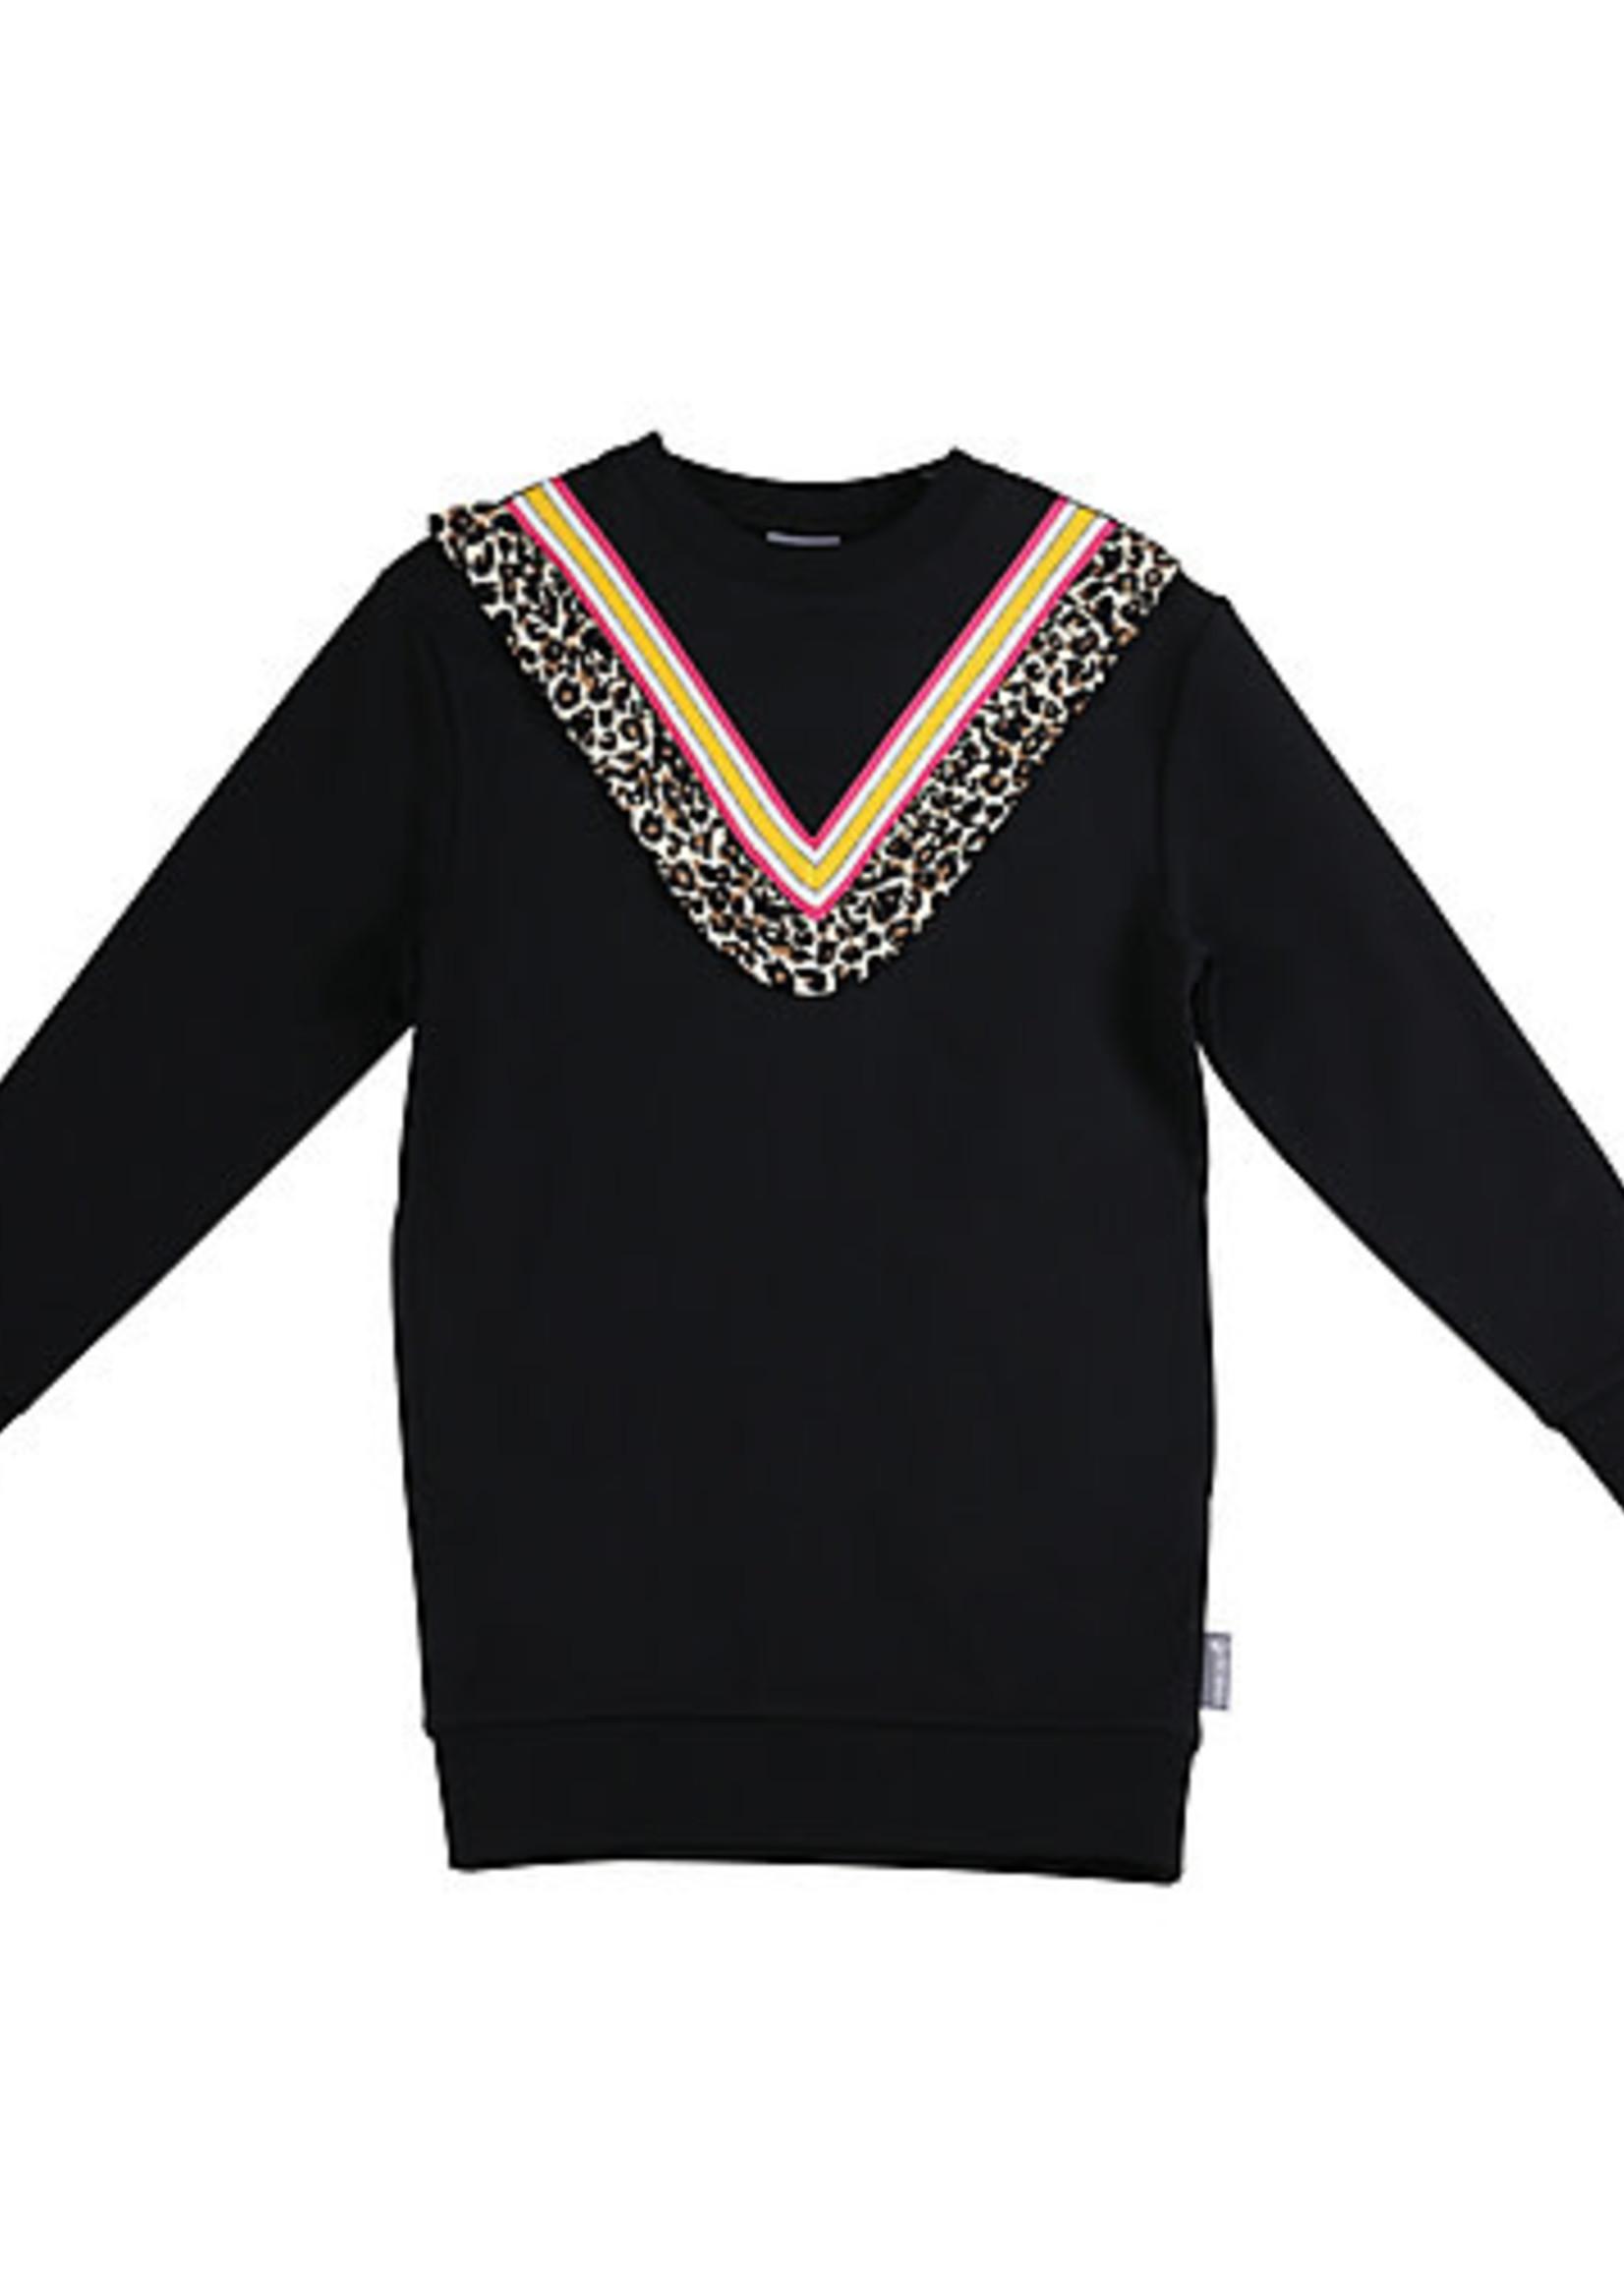 vinrose Kleedje black driehoek Vinrose